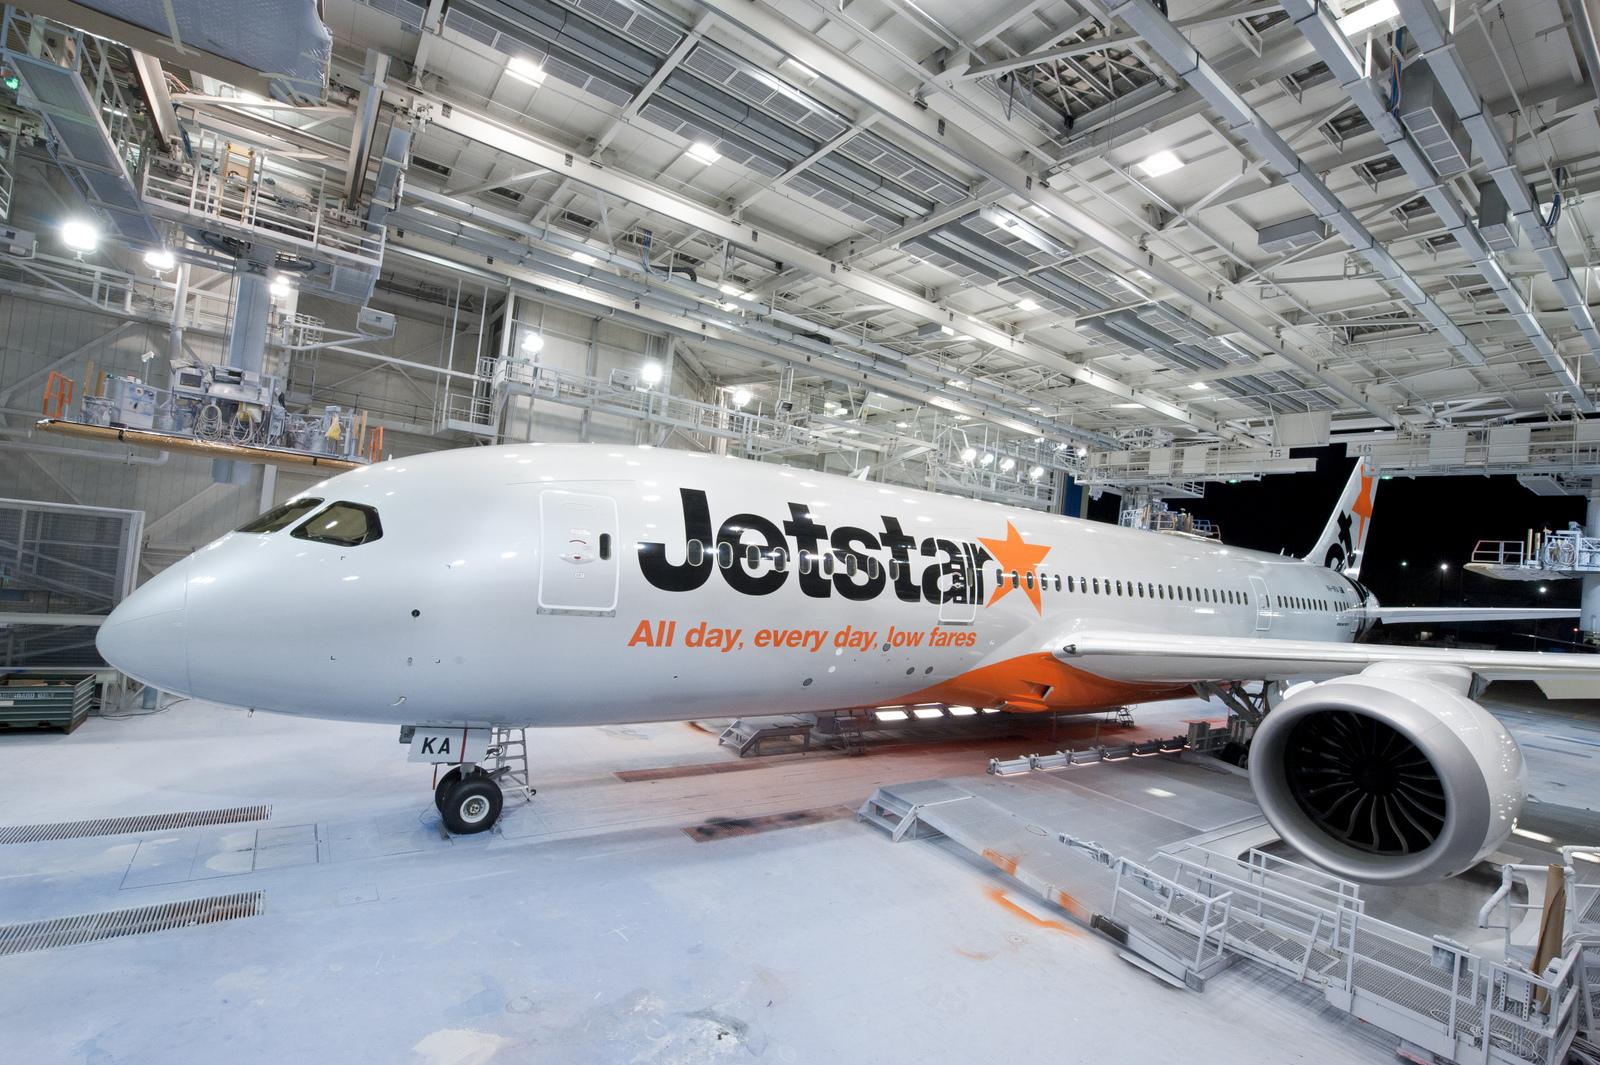 Exclusive Aerial Photo Of Jetstar Airway S First Boeing